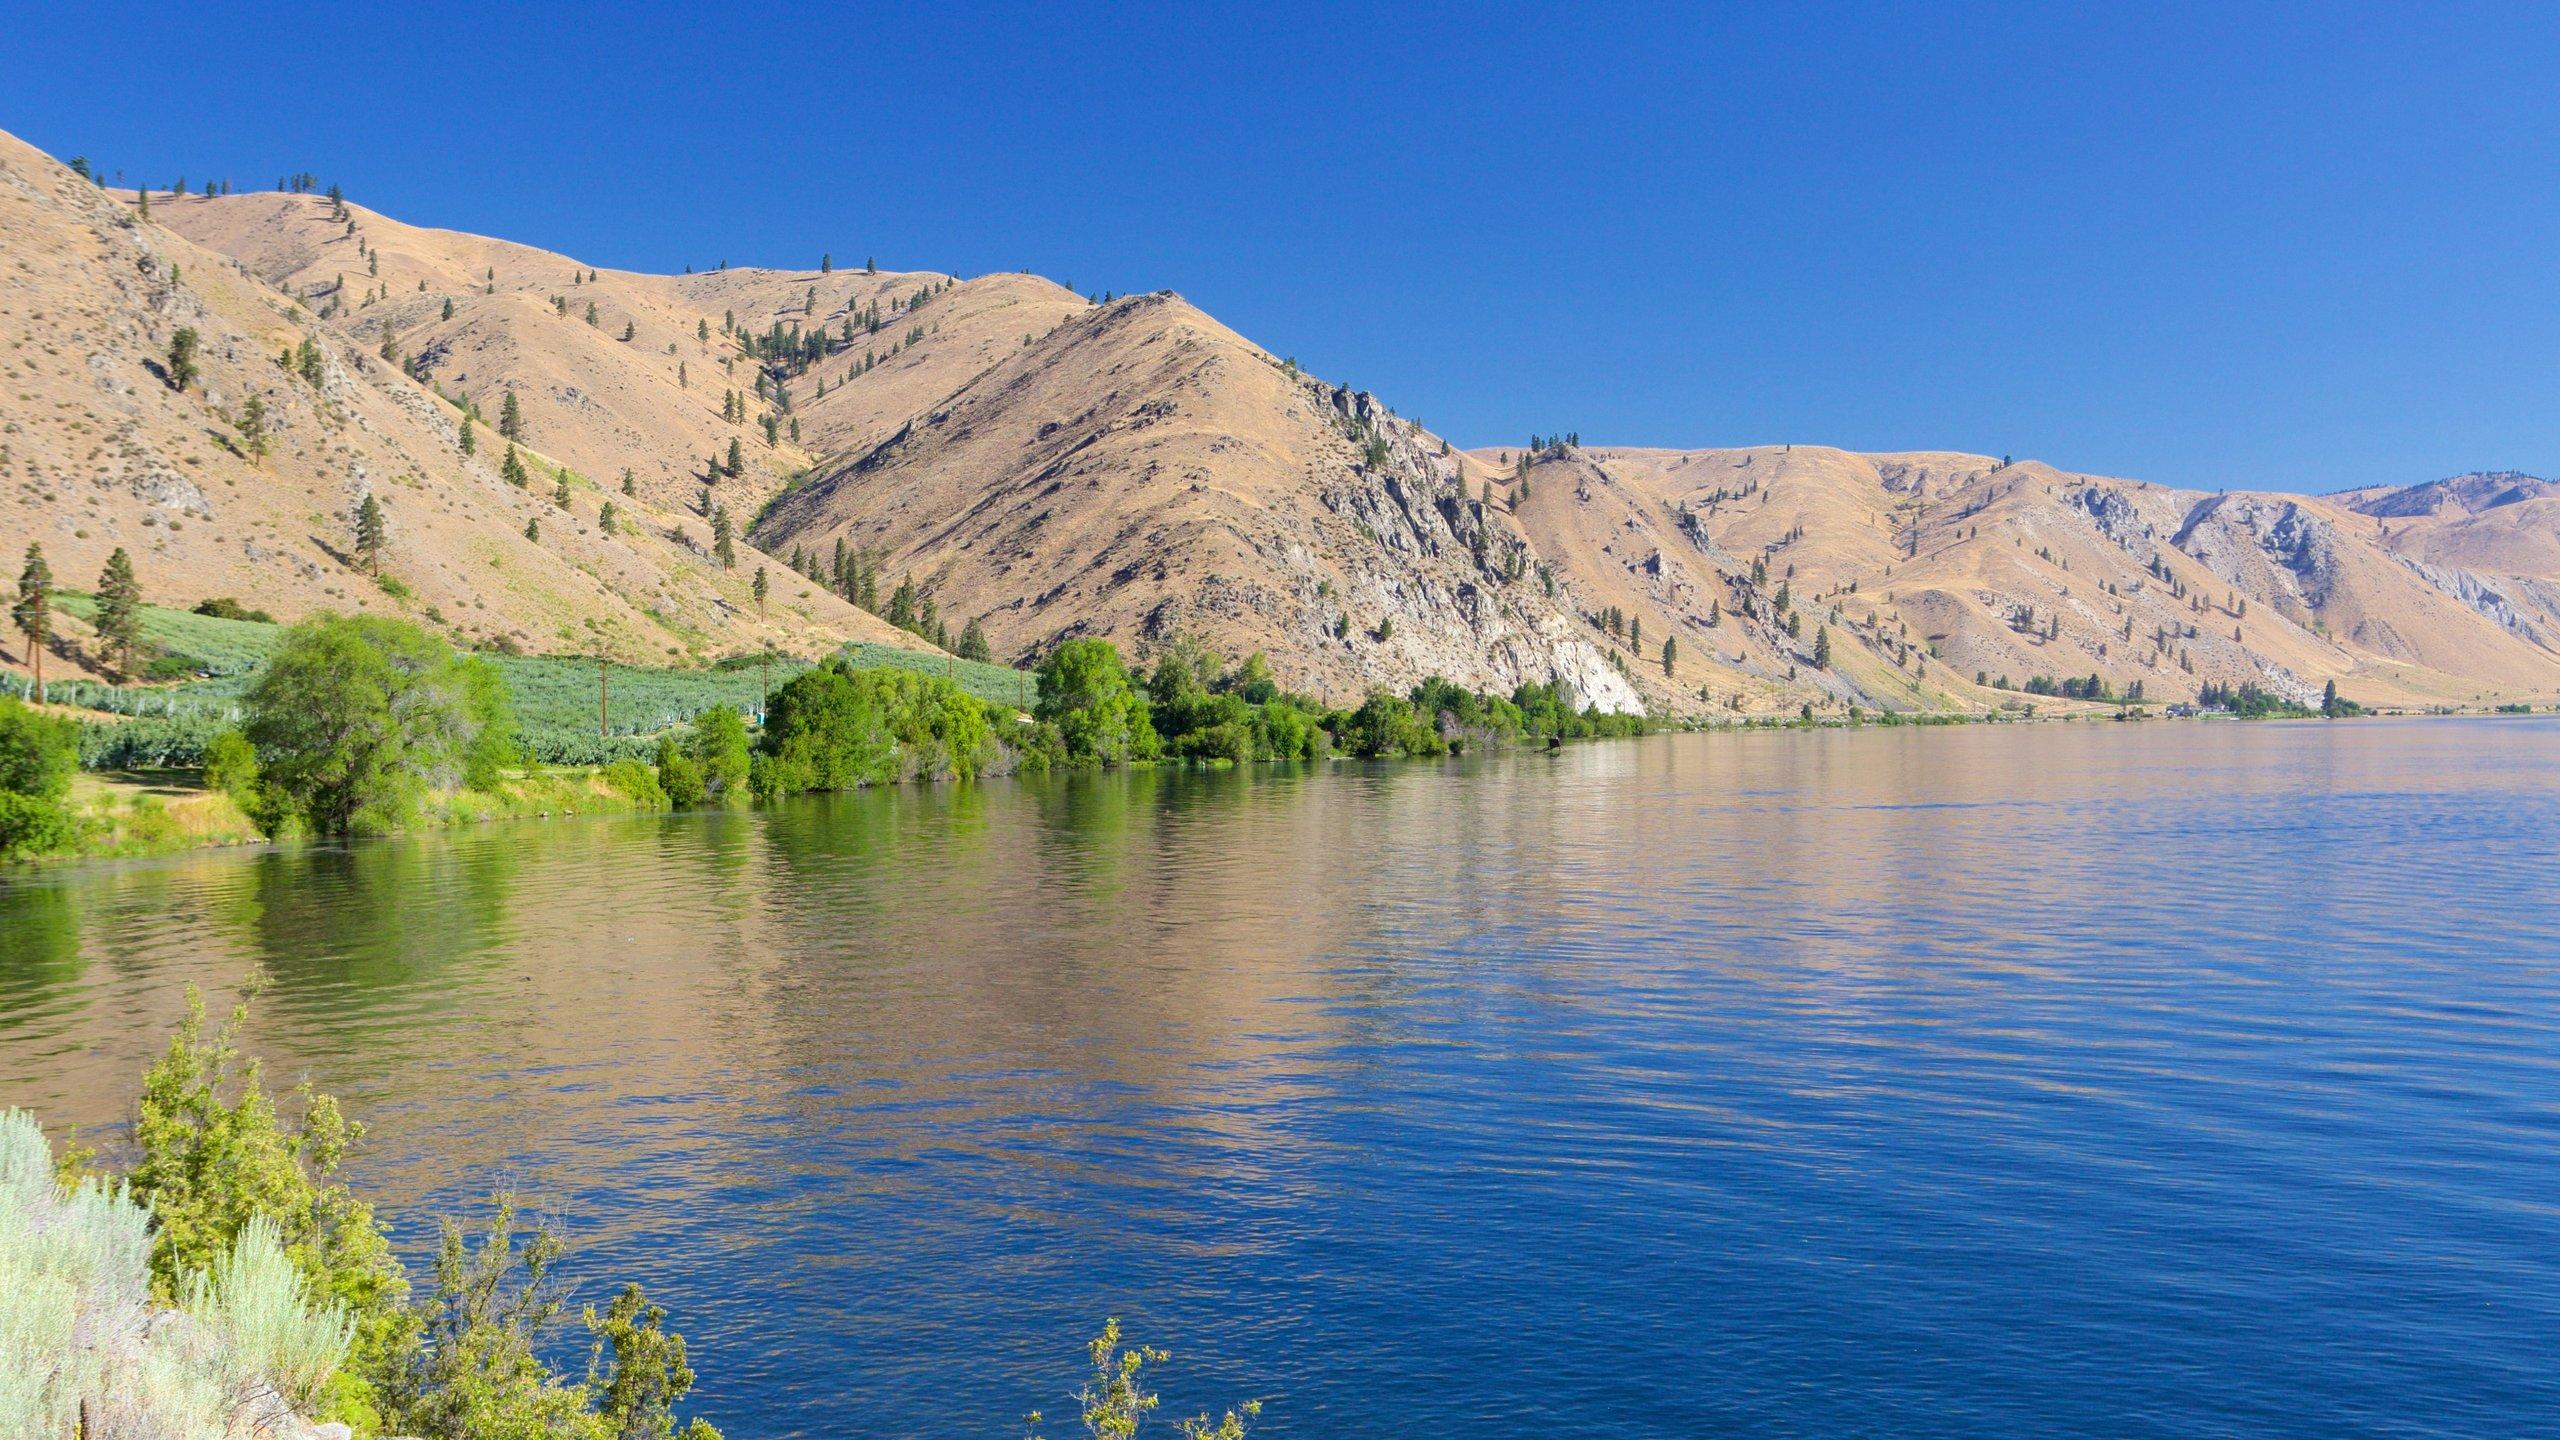 Lake Chelan, Chelan, Washington, United States of America